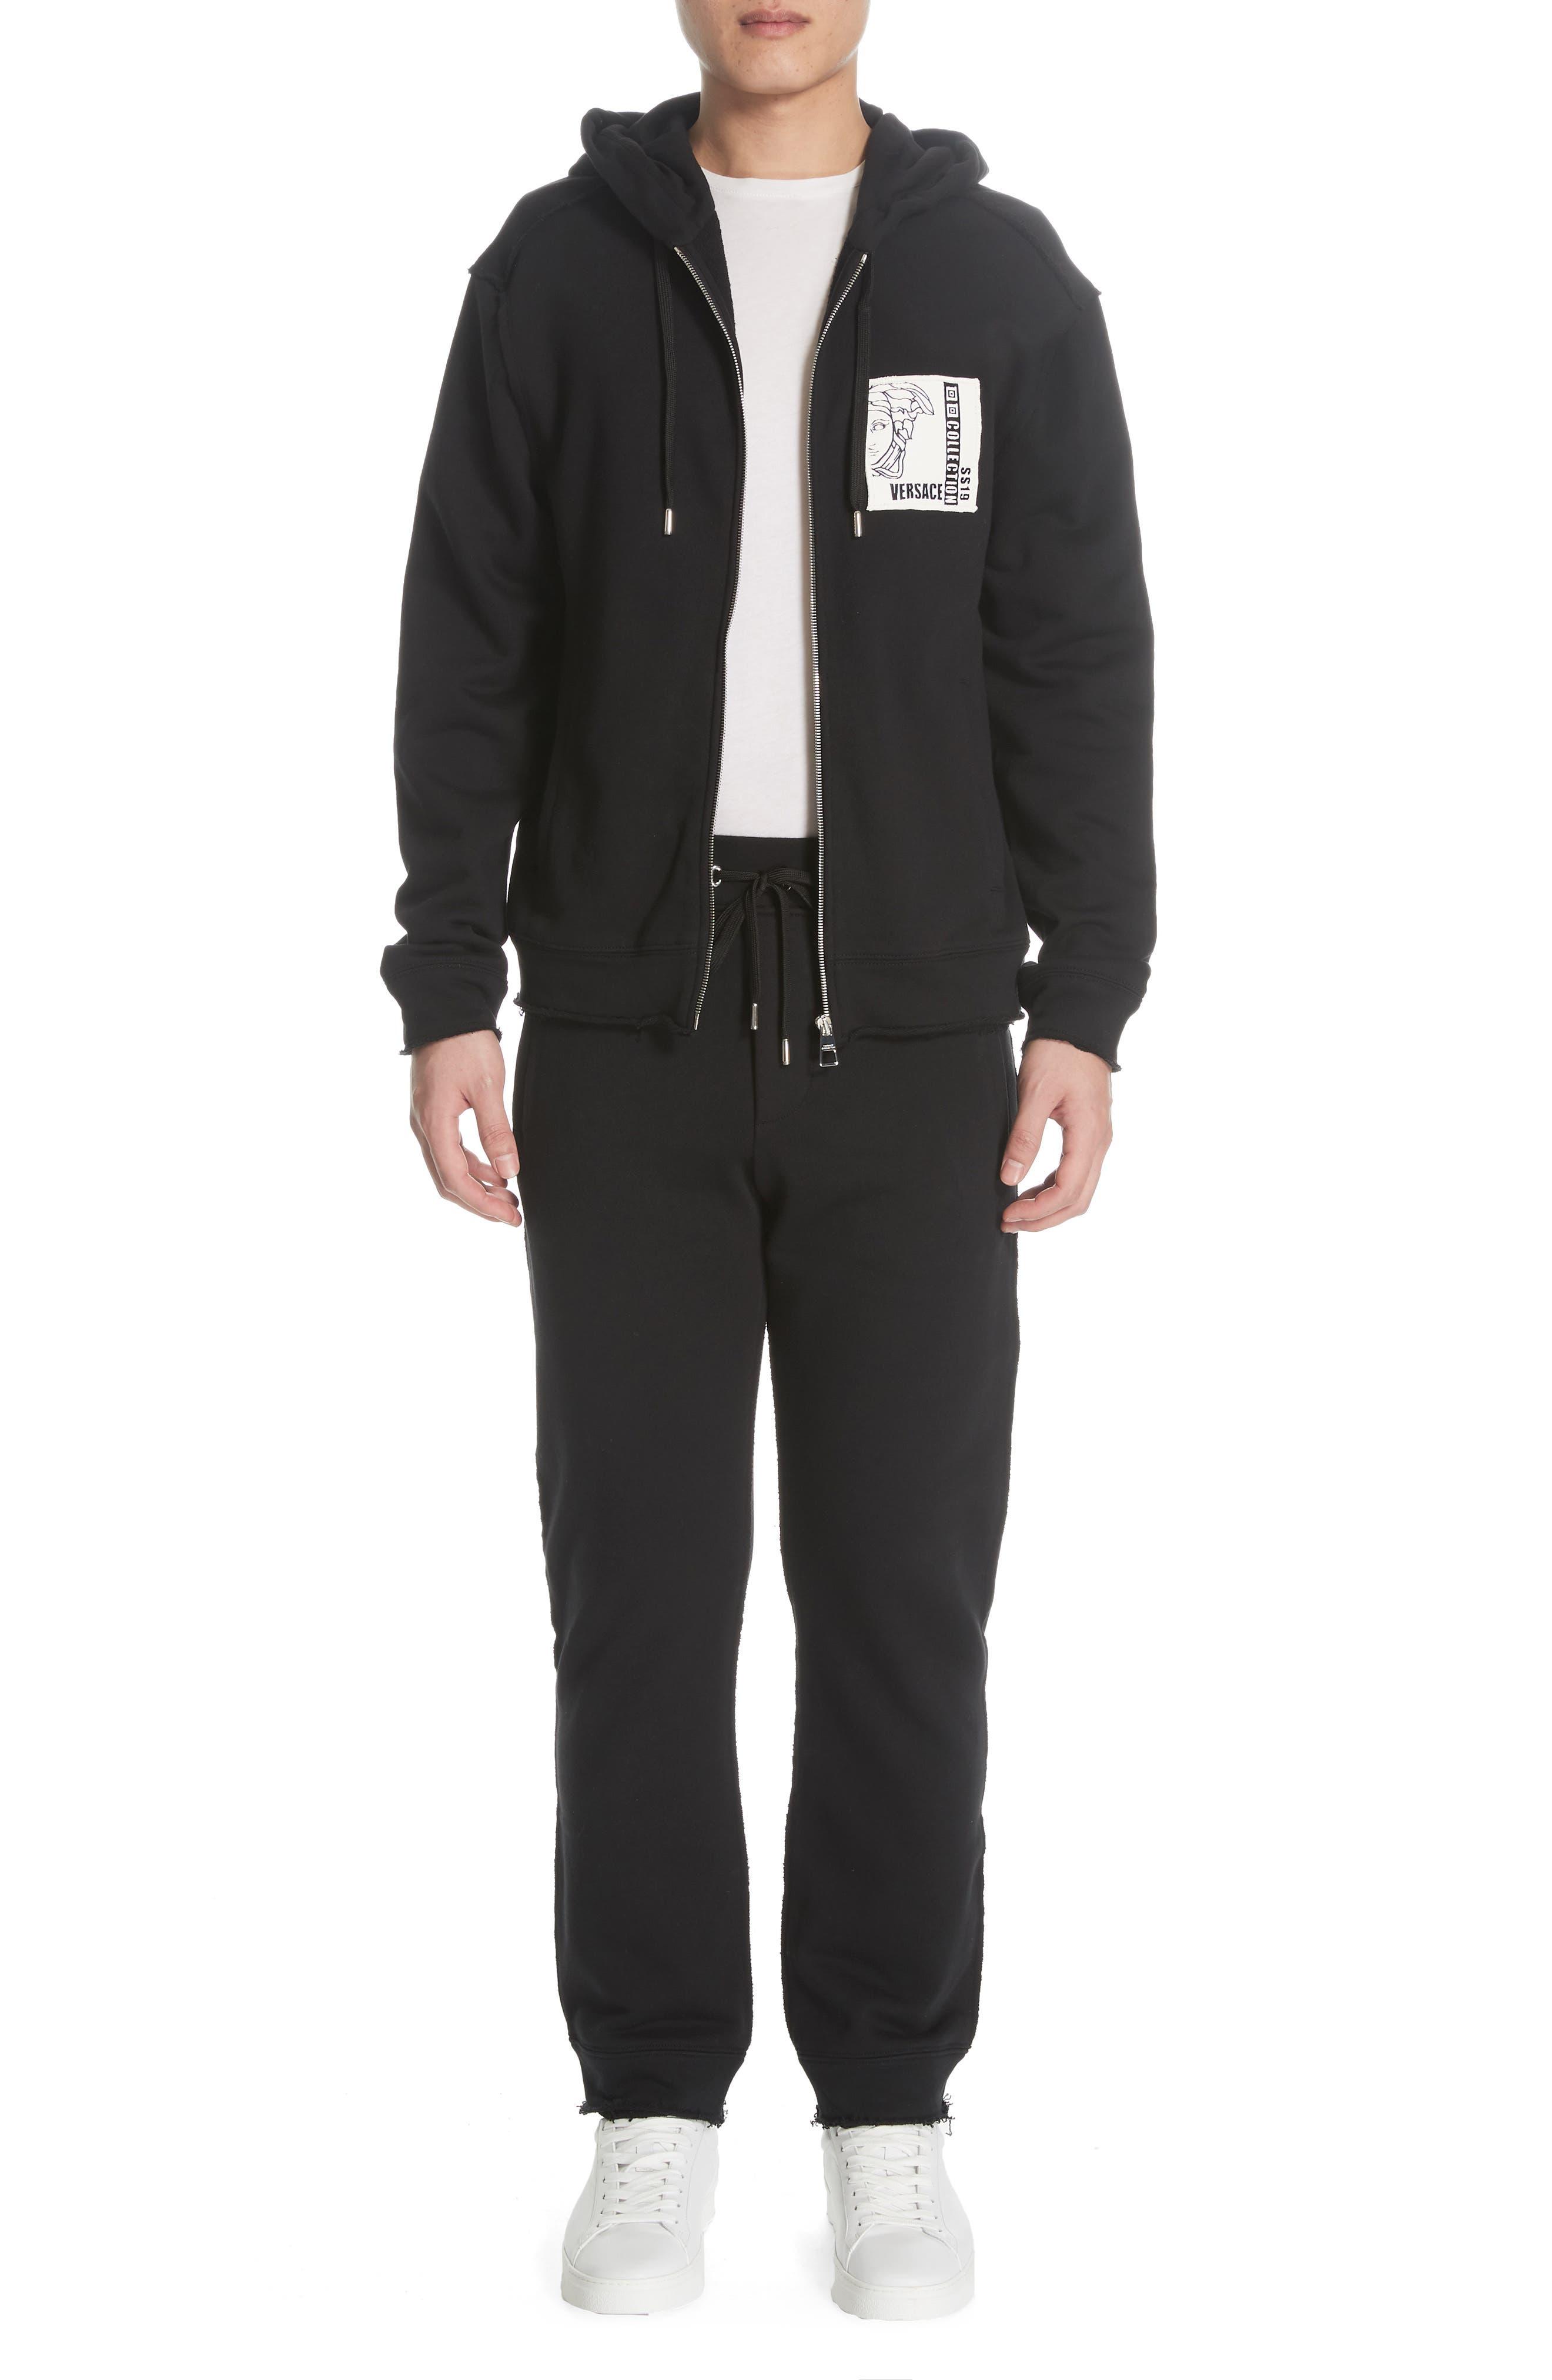 VERSACE COLLECTION Zip Hoodie & Track Pants Set, Main, color, BLACK